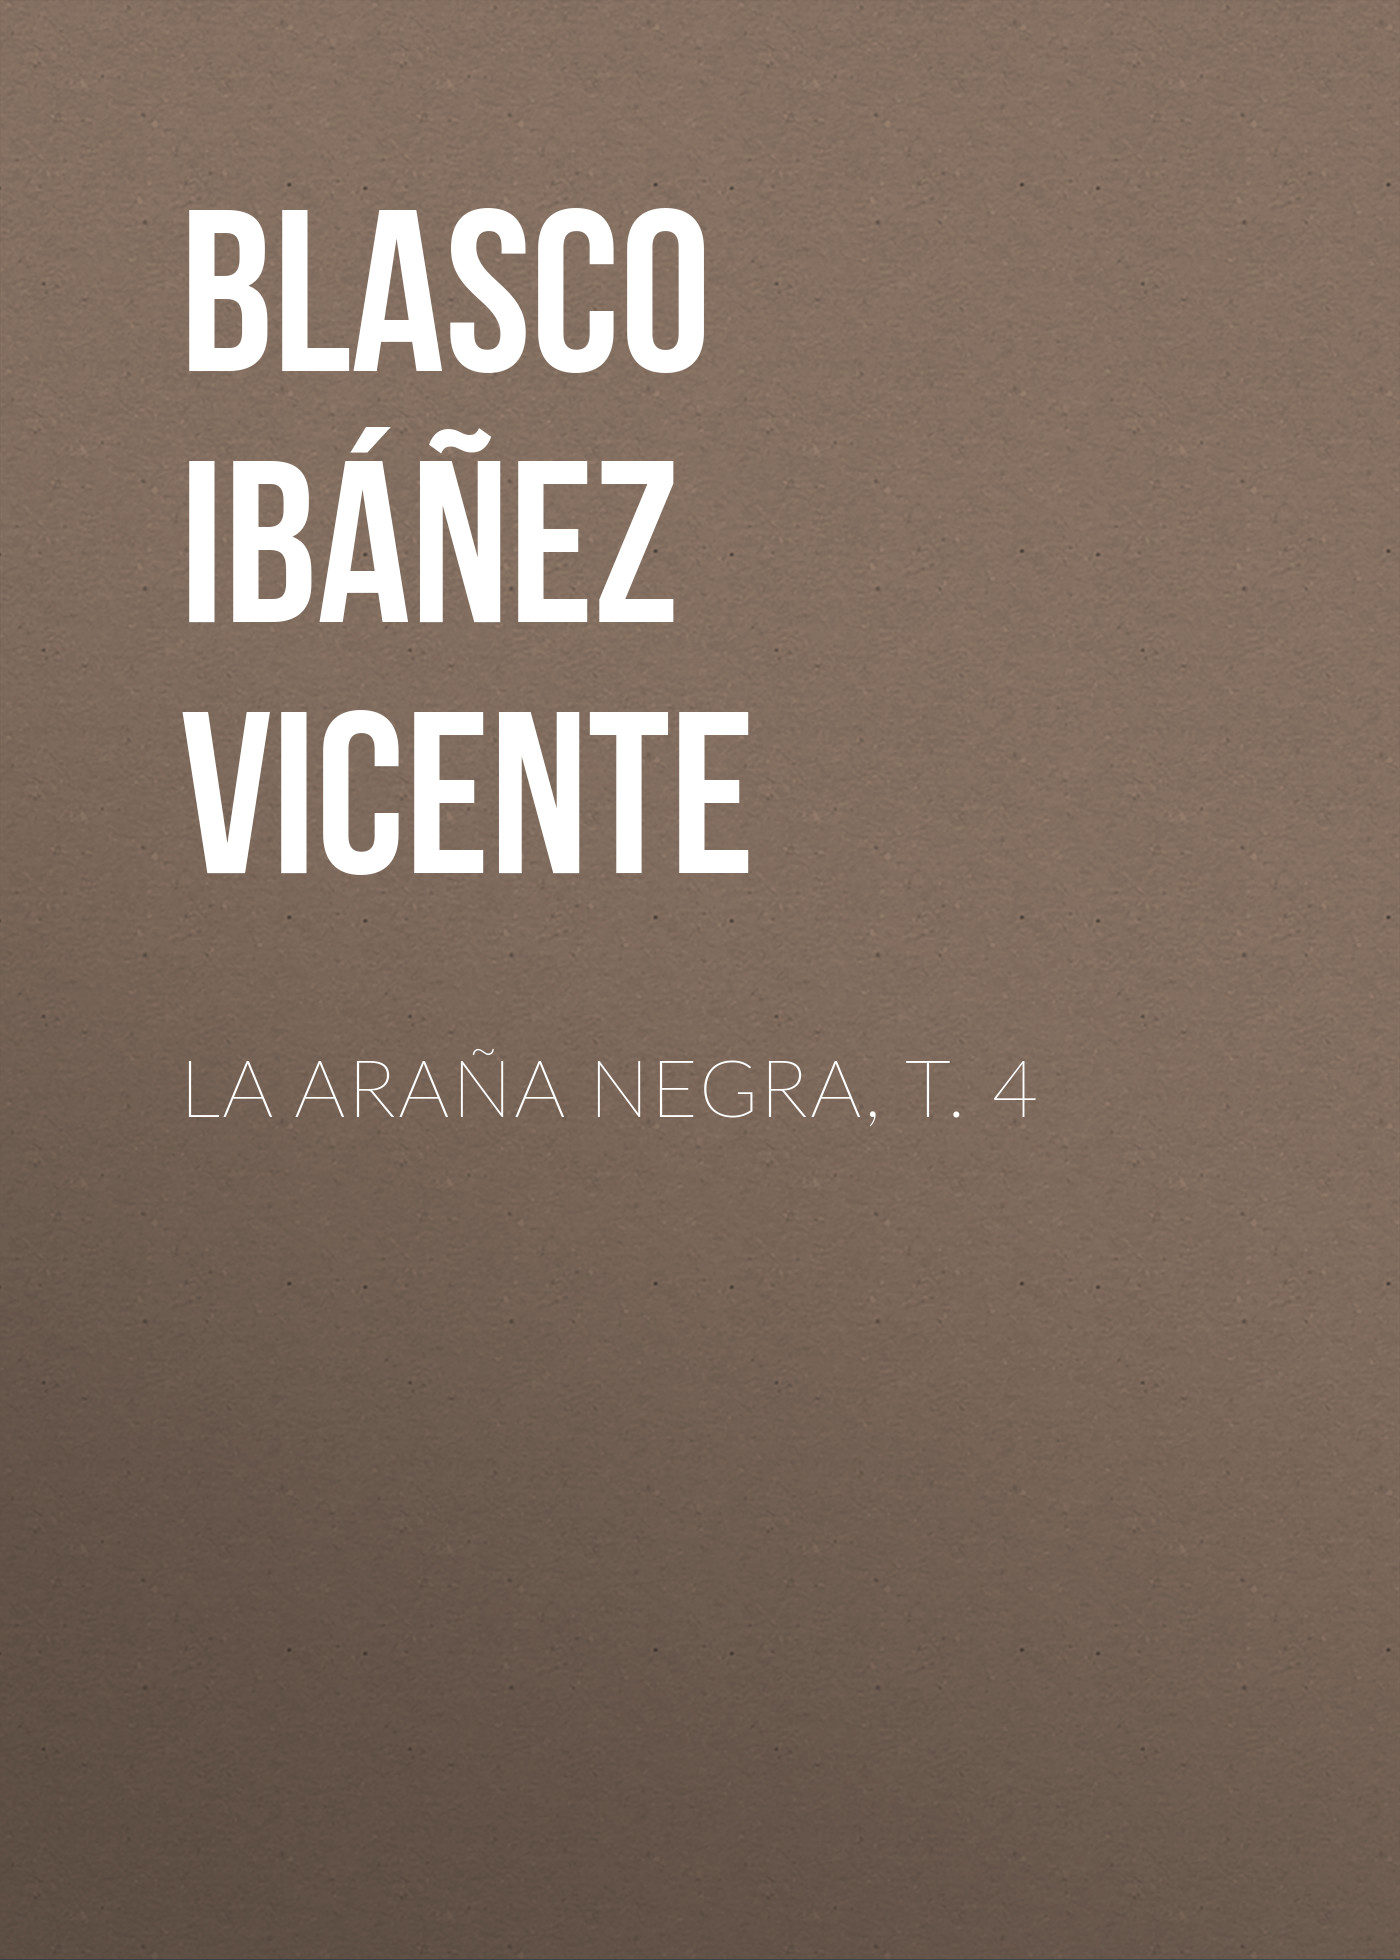 Blasco Ibáñez Vicente La araña negra, t. 4 blasco ibáñez vicente la araña negra t 1